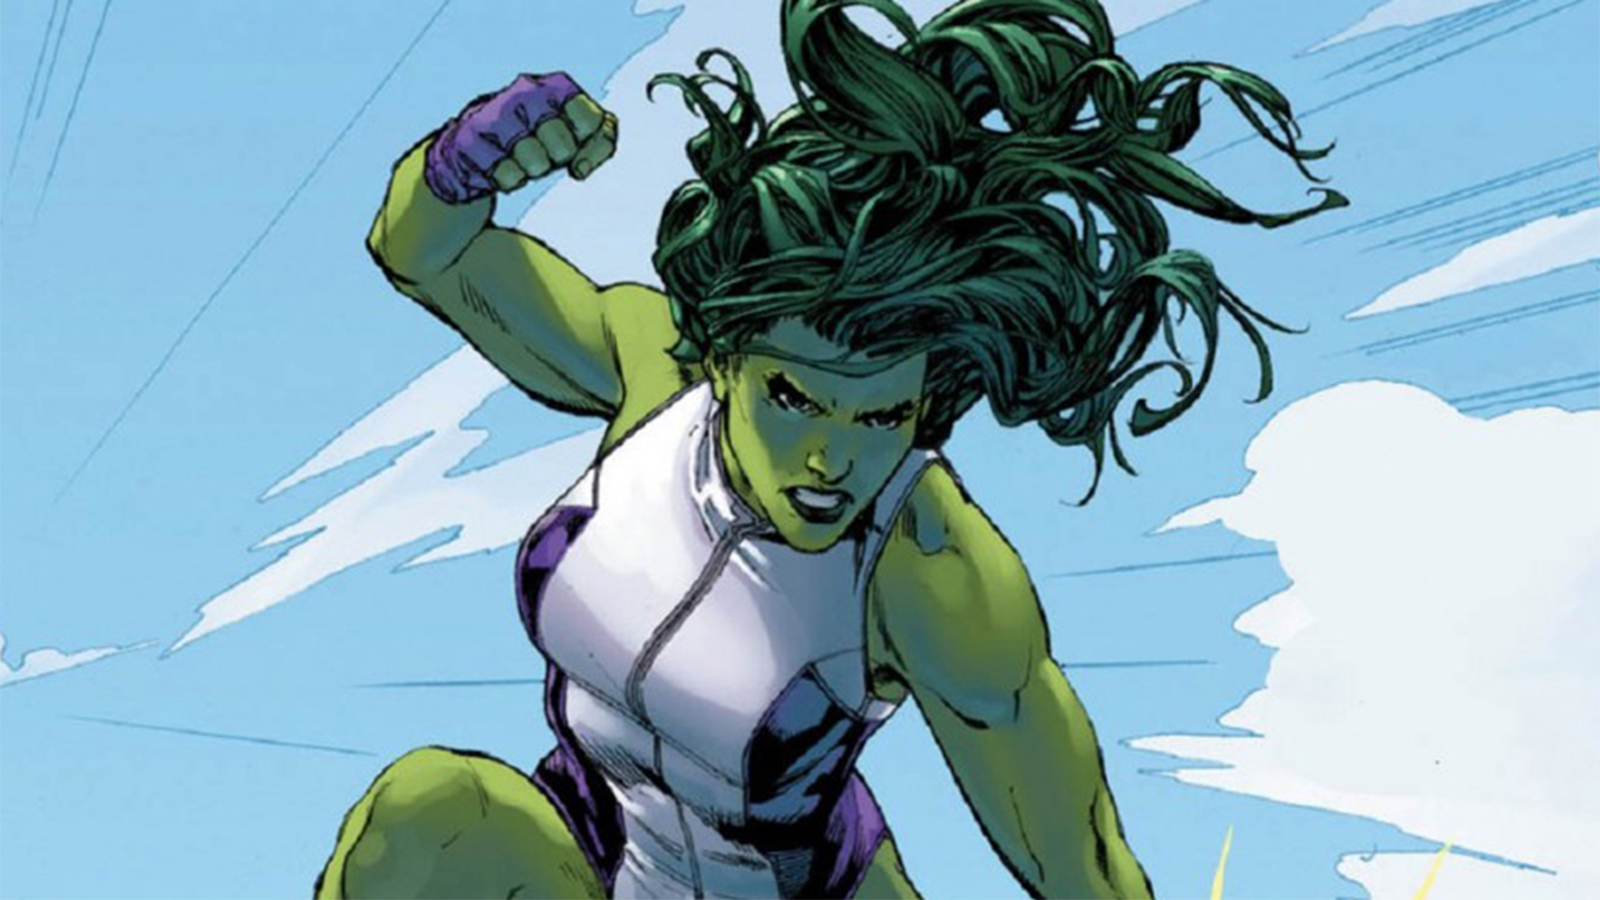 She-Hulk in the Marvel comics